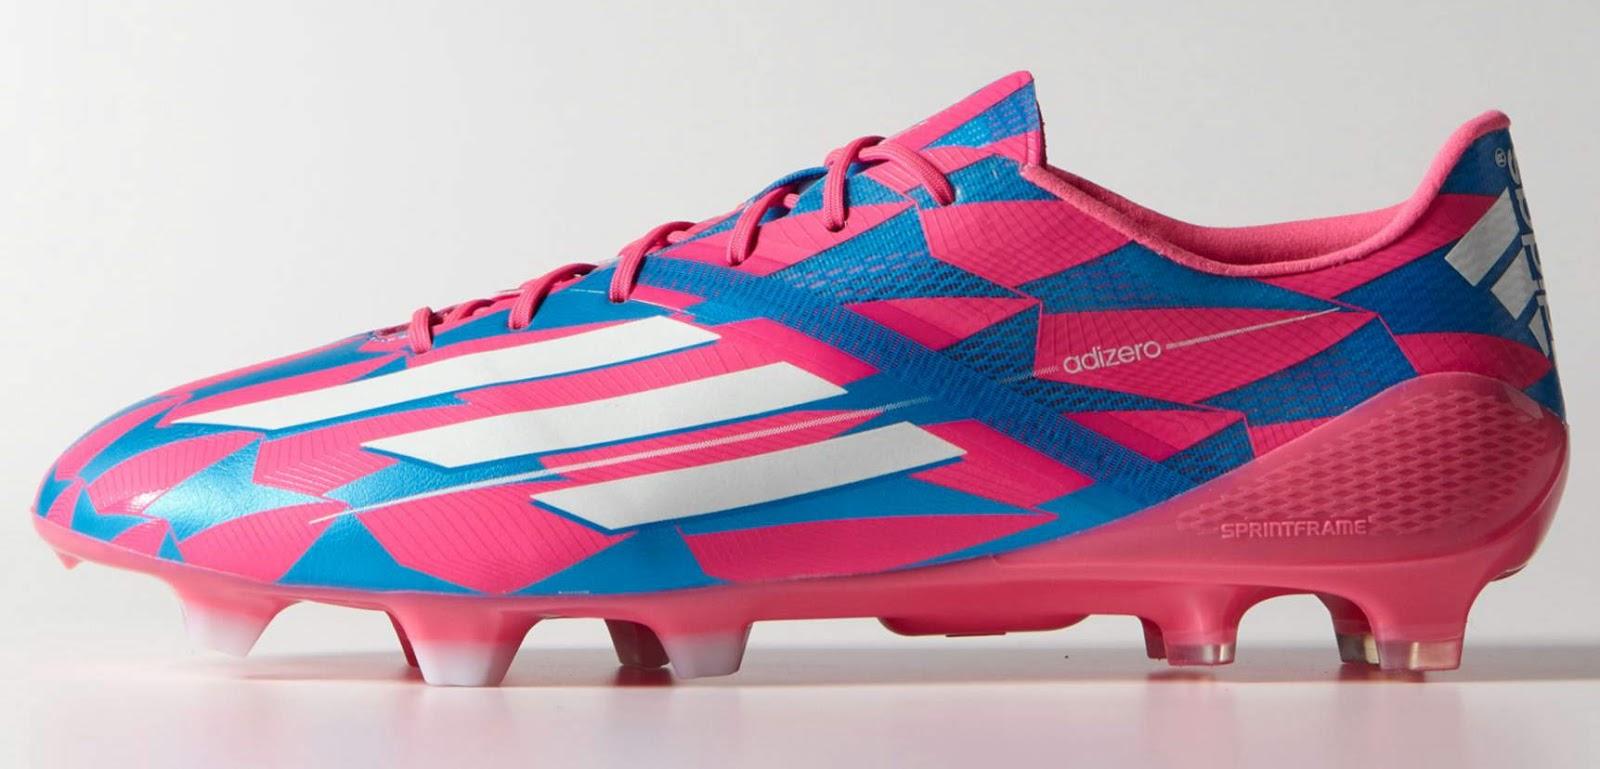 pink adidas adizero iv 201415 boot colorway released